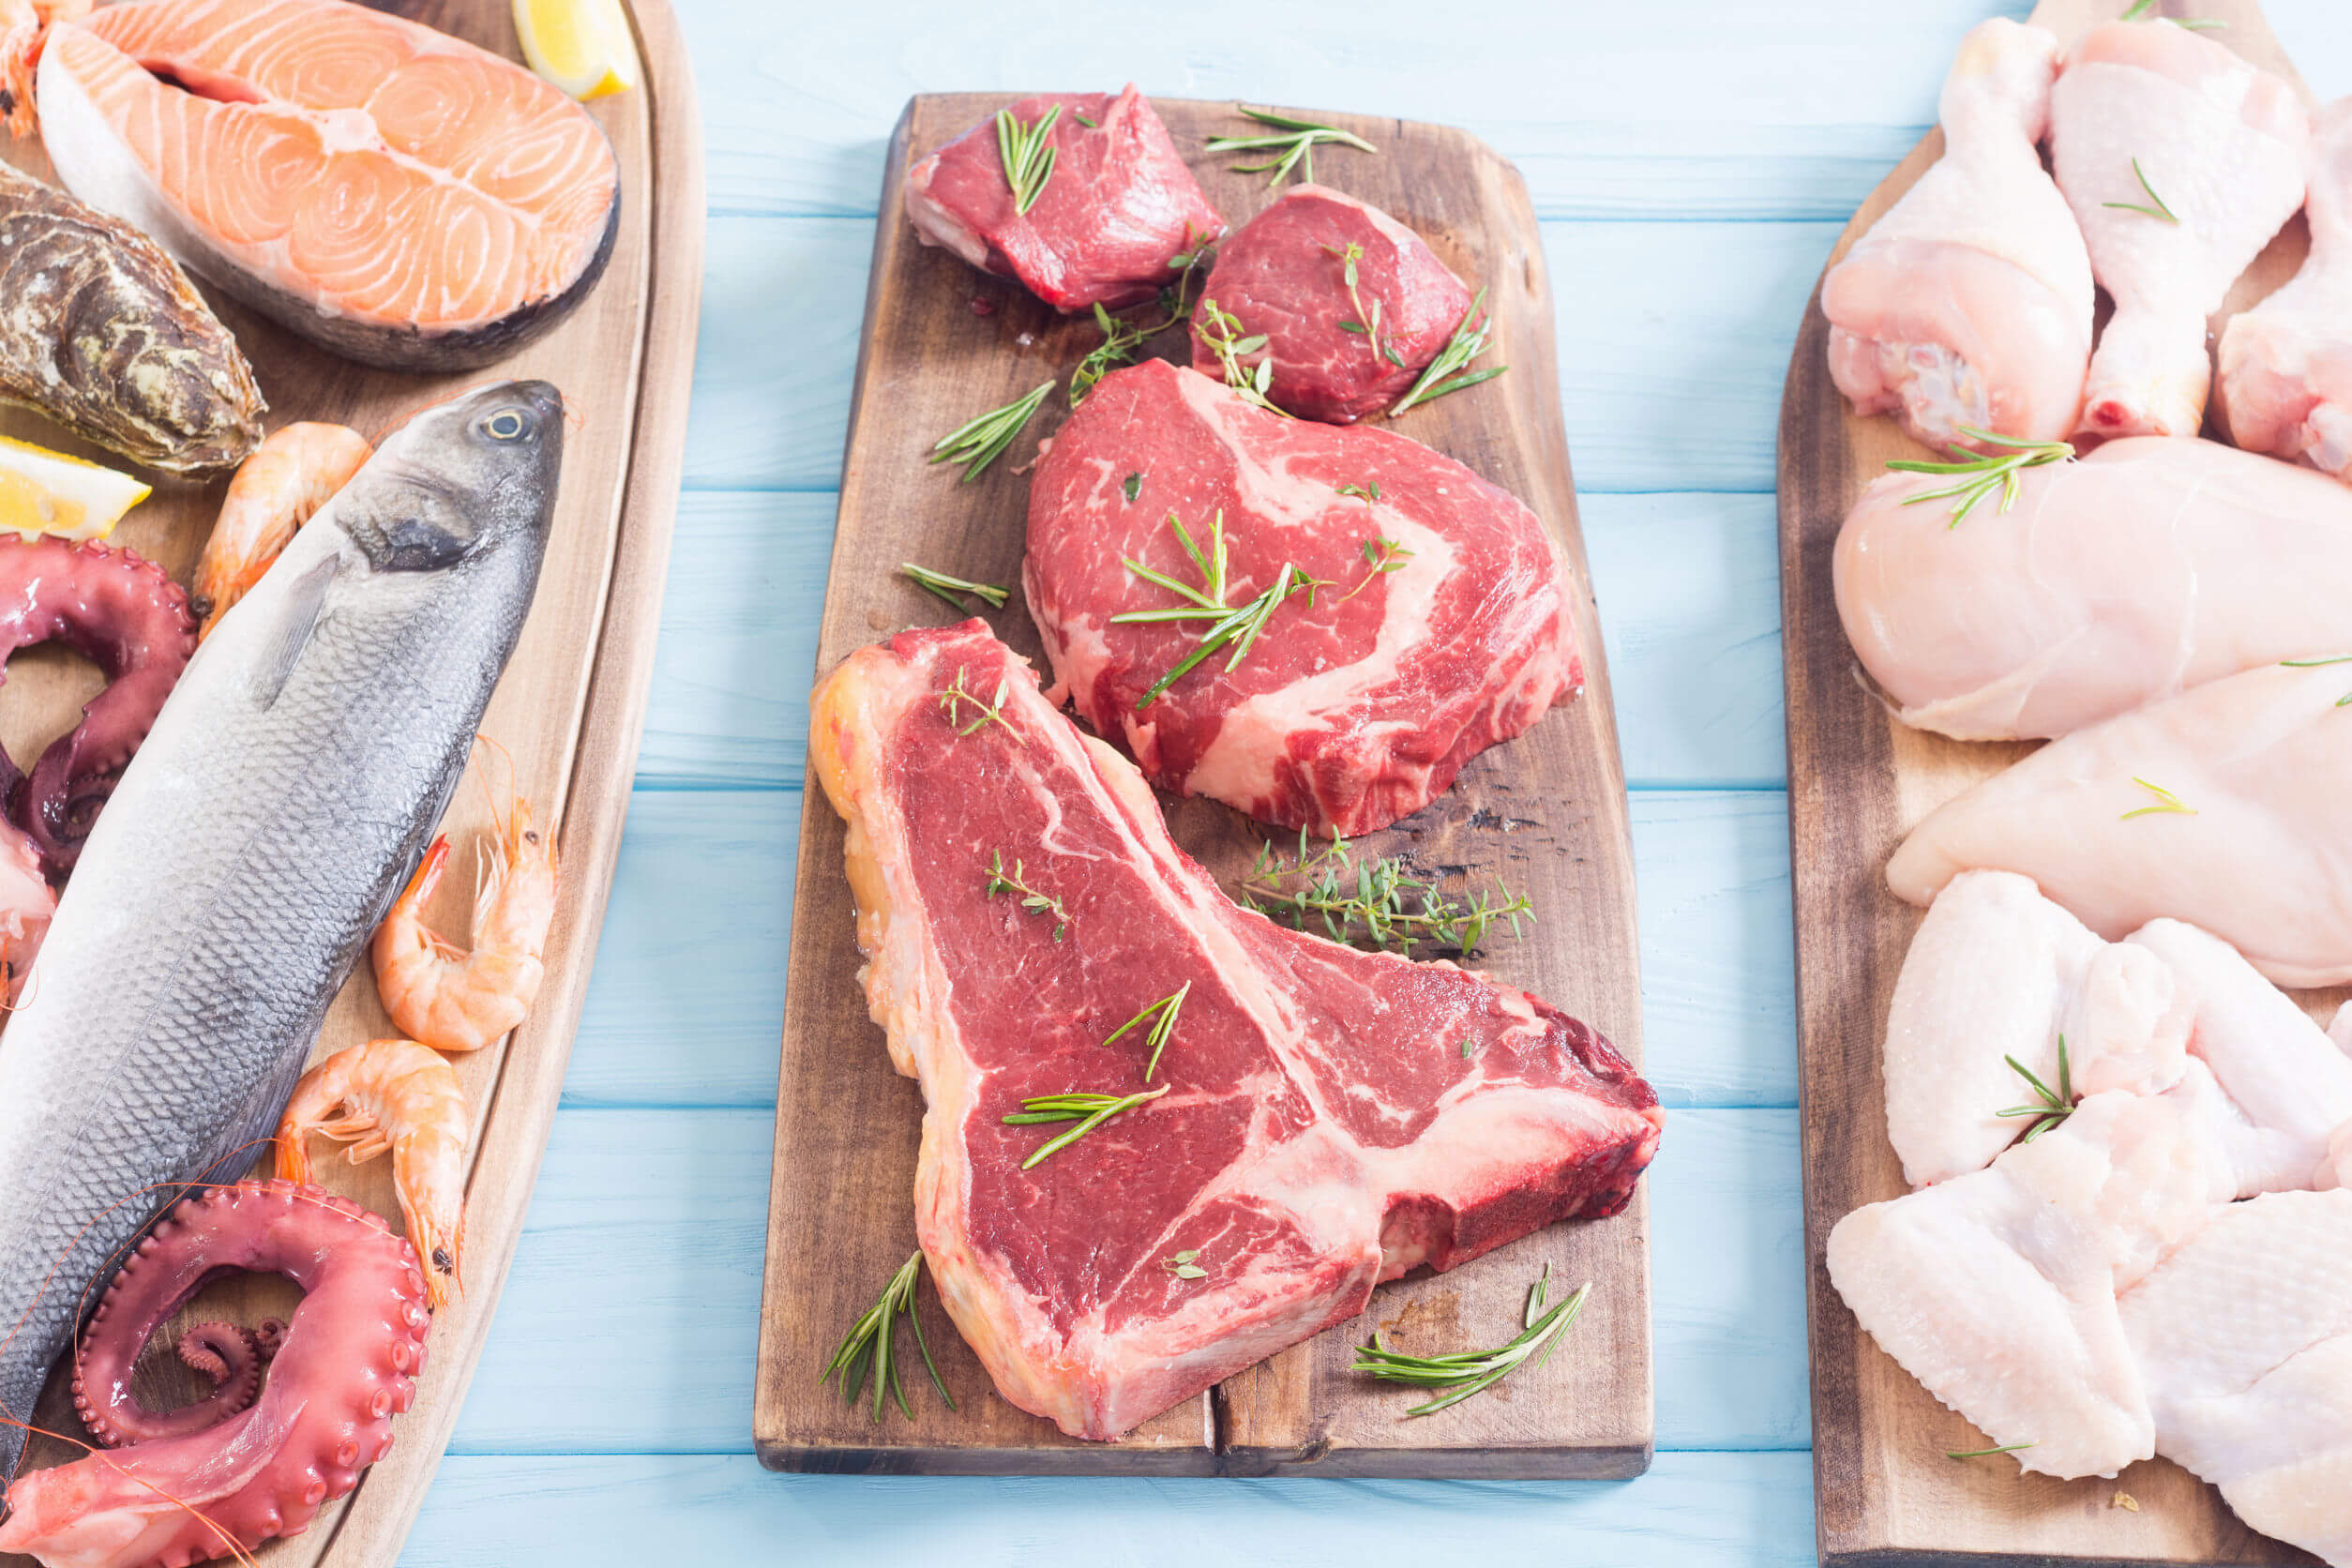 4 enfermedades transmitidas por alimentos